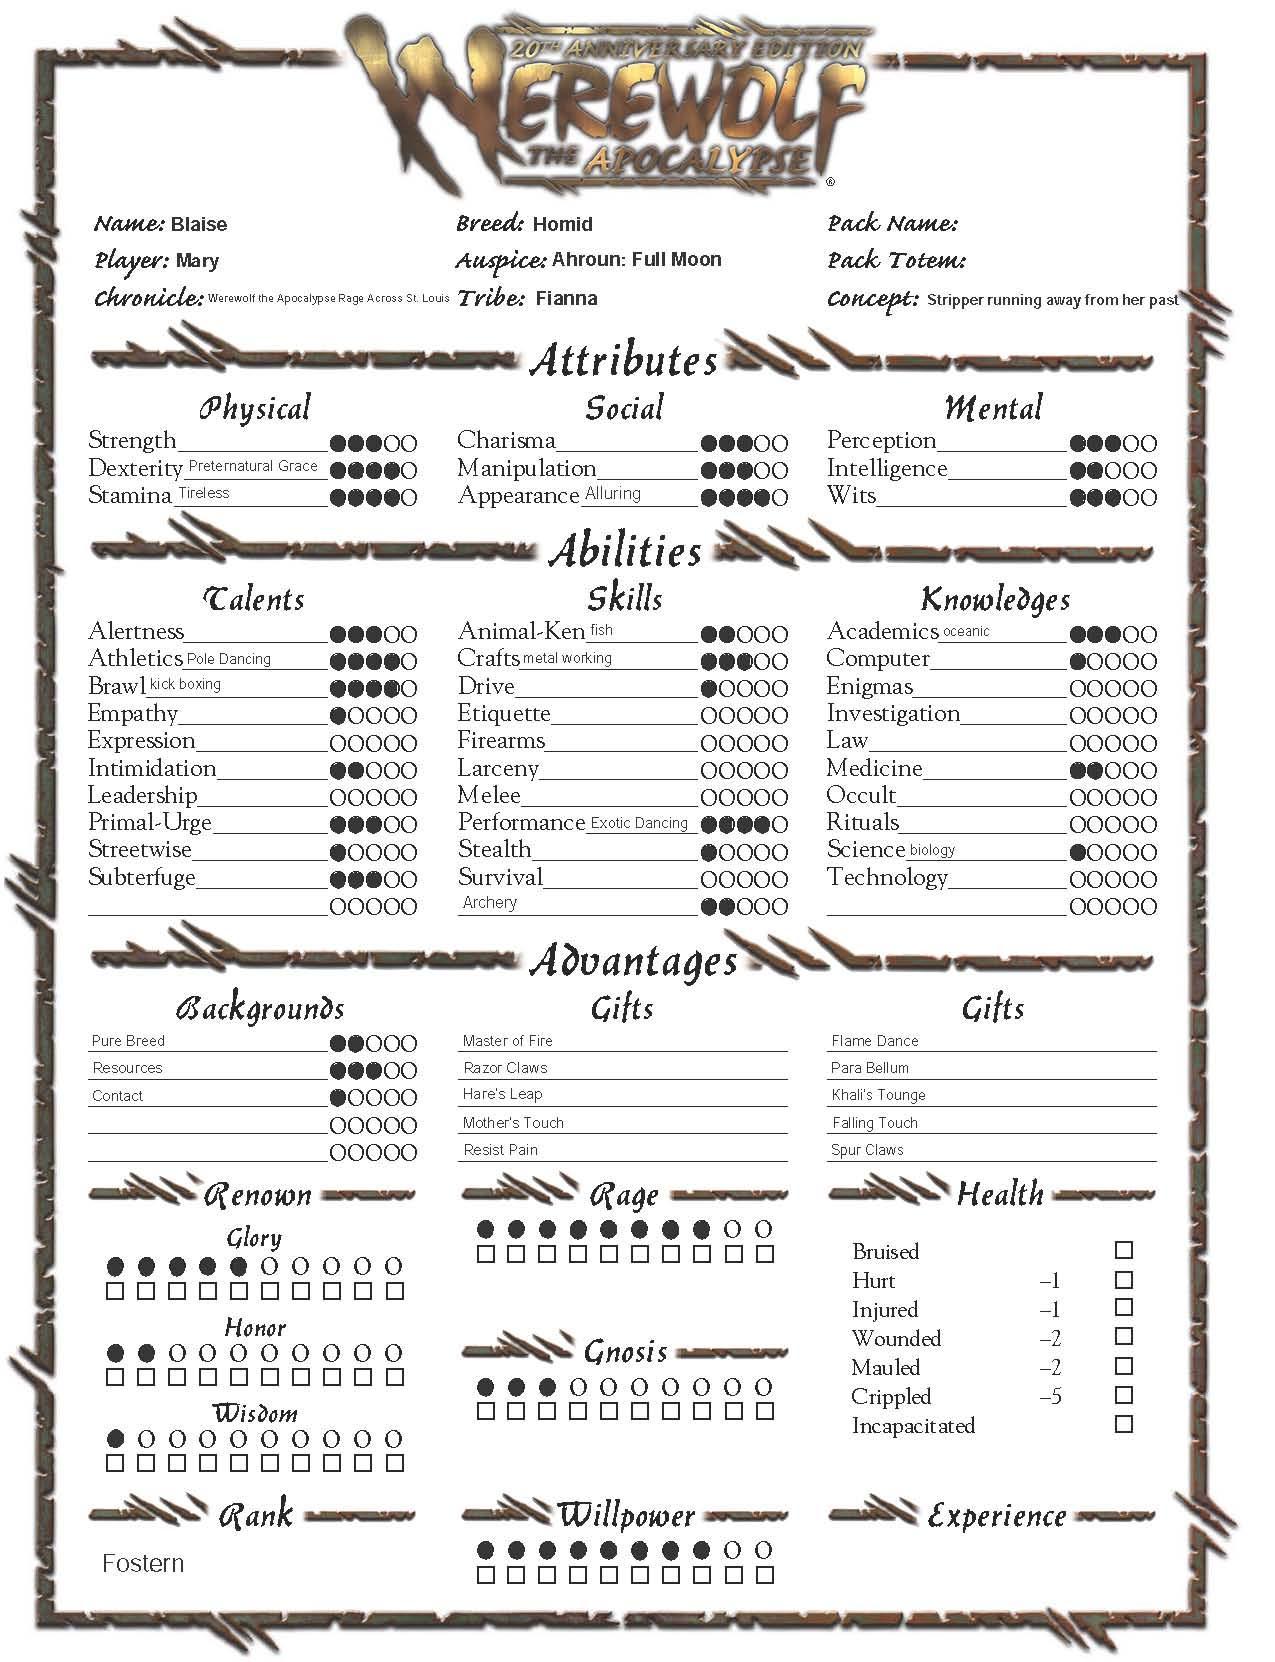 Blaise_Character_Sheet_Page_1.jpg